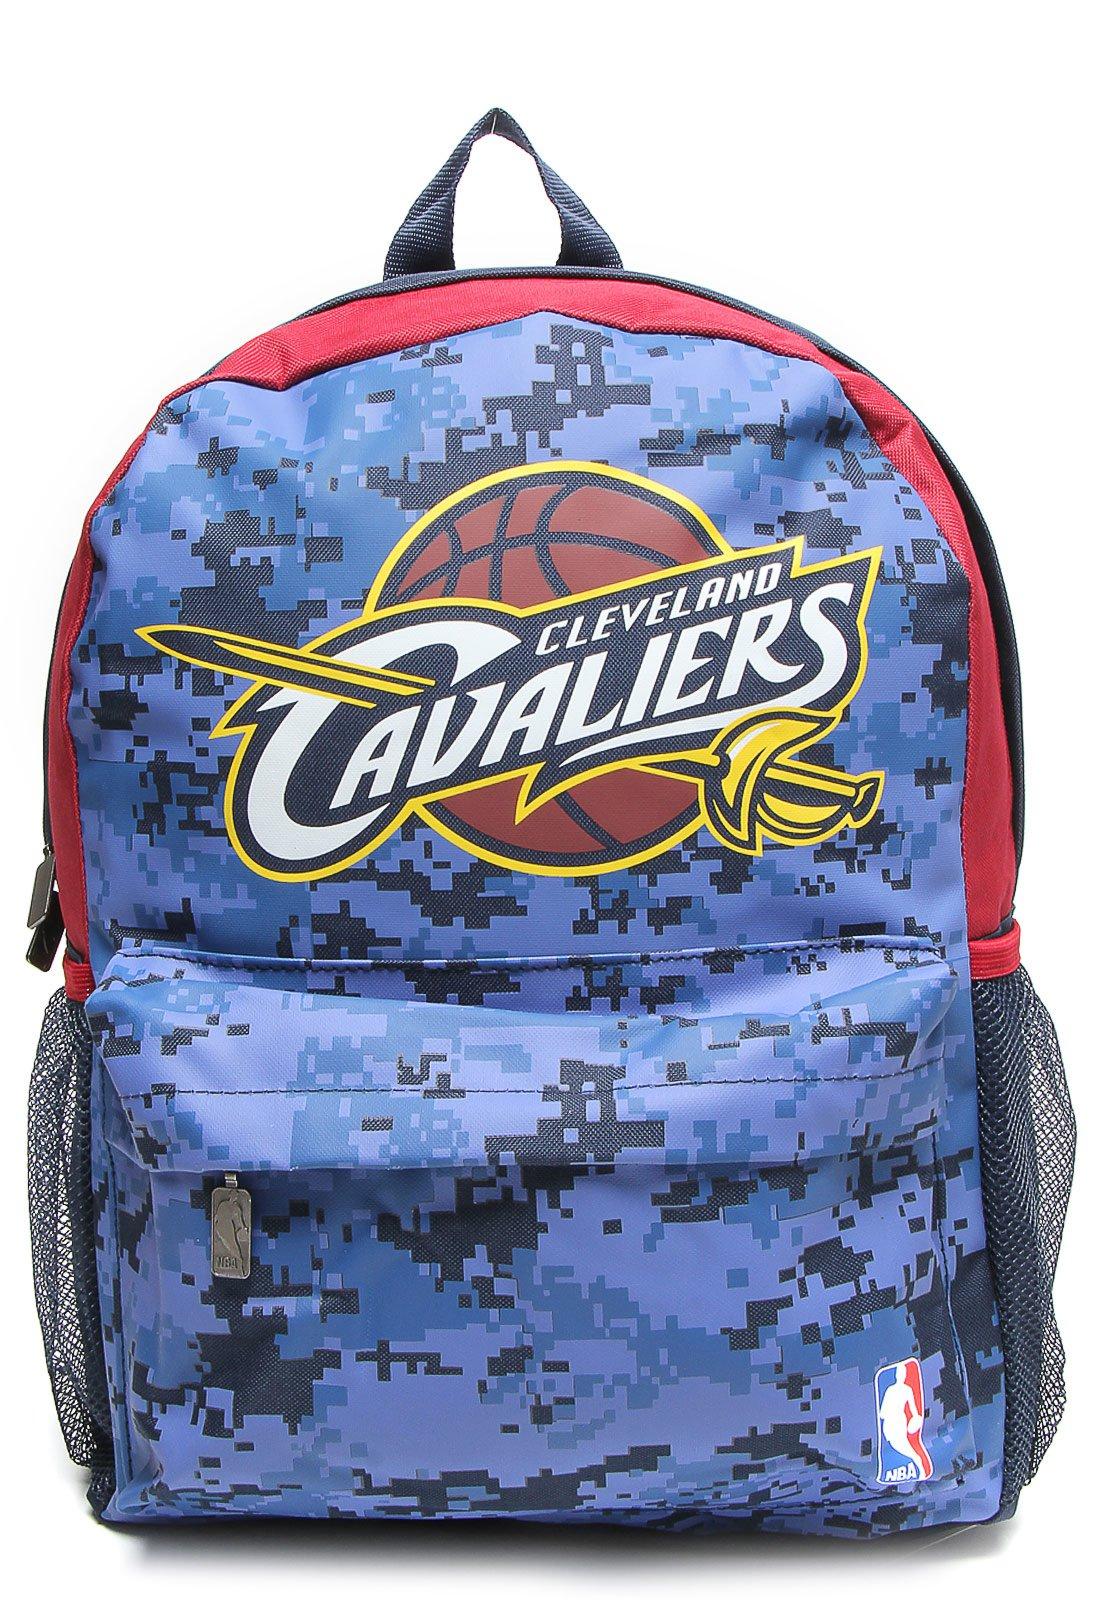 a0fe134f4 Mochila NBA Média Cavaliers Sublimada 17 Azul - Compre Agora | Kanui Brasil